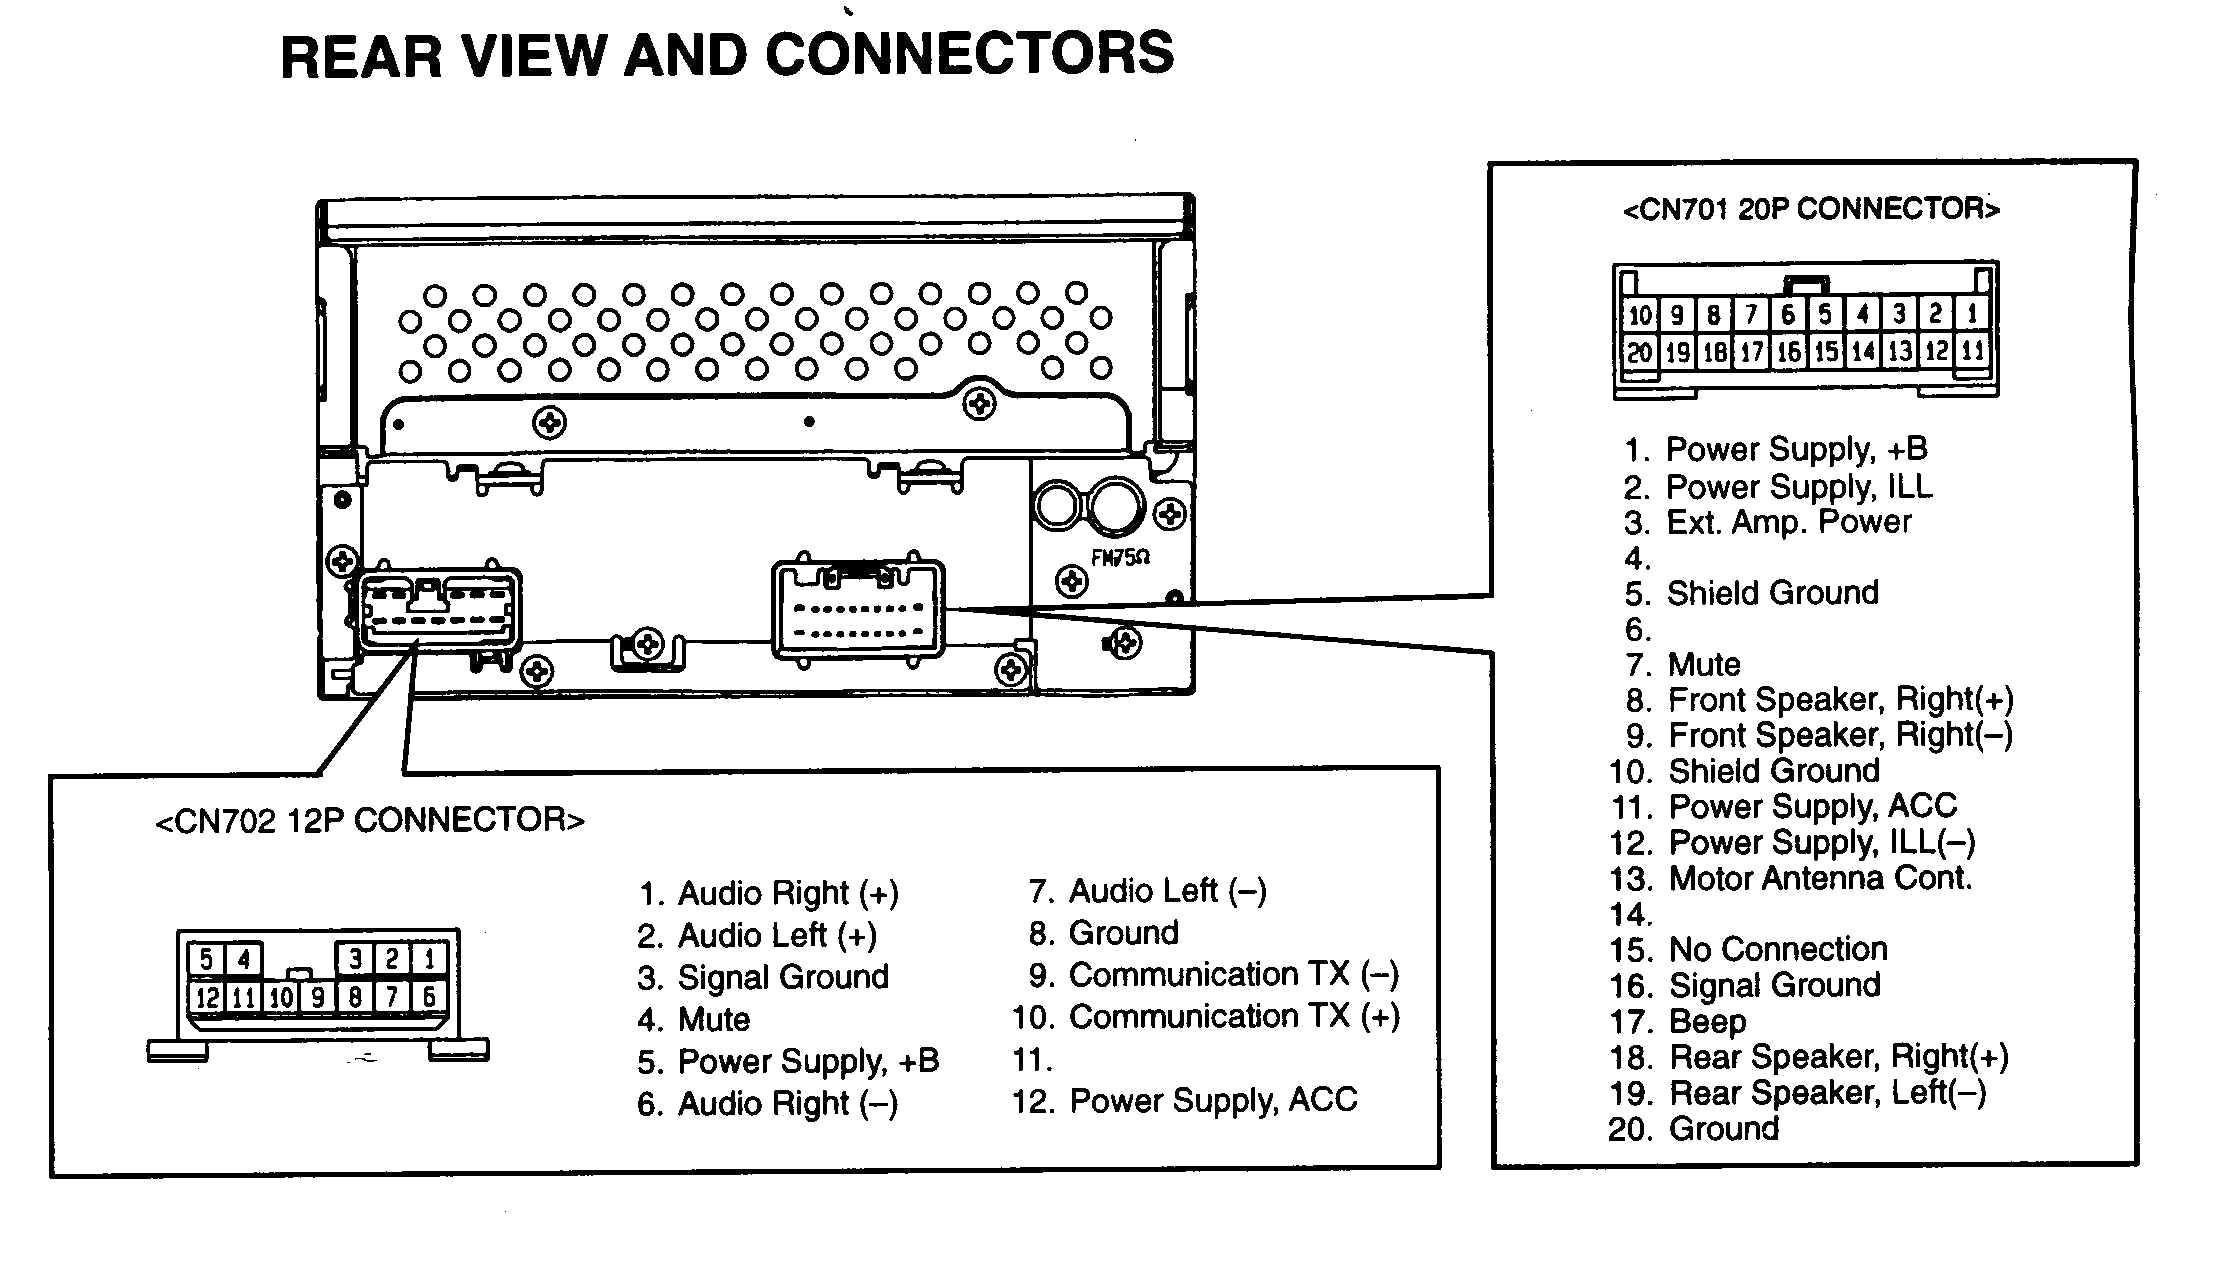 Oldsmobile Alero Engine Diagram 2001 Oldsmobile Alero Stereo Wiring Diagram 2002 Worksheet and Of Oldsmobile Alero Engine Diagram